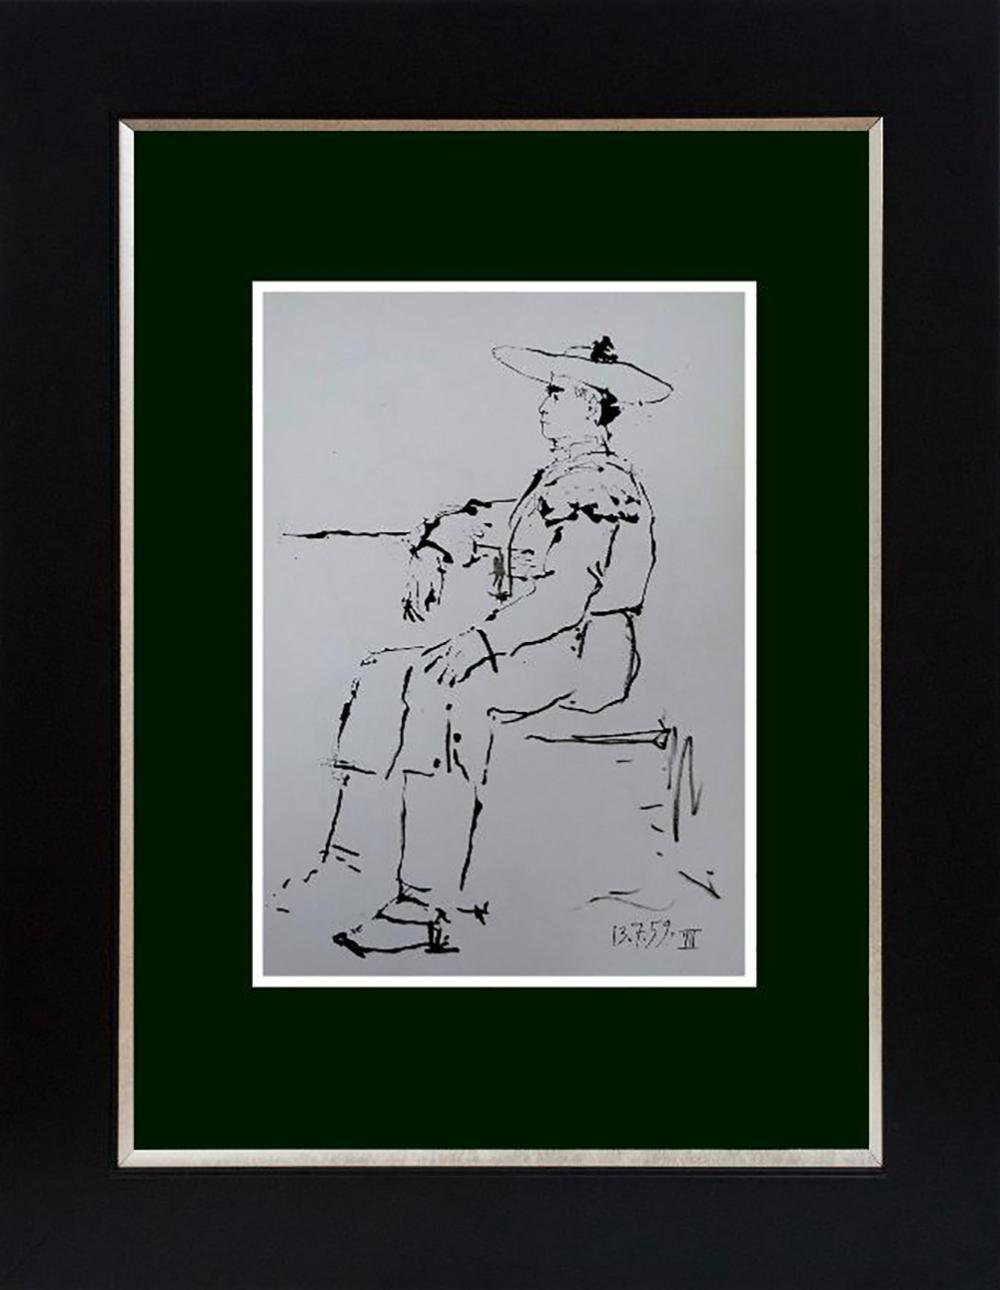 Lot 7087: Pablo Picasso lithograph